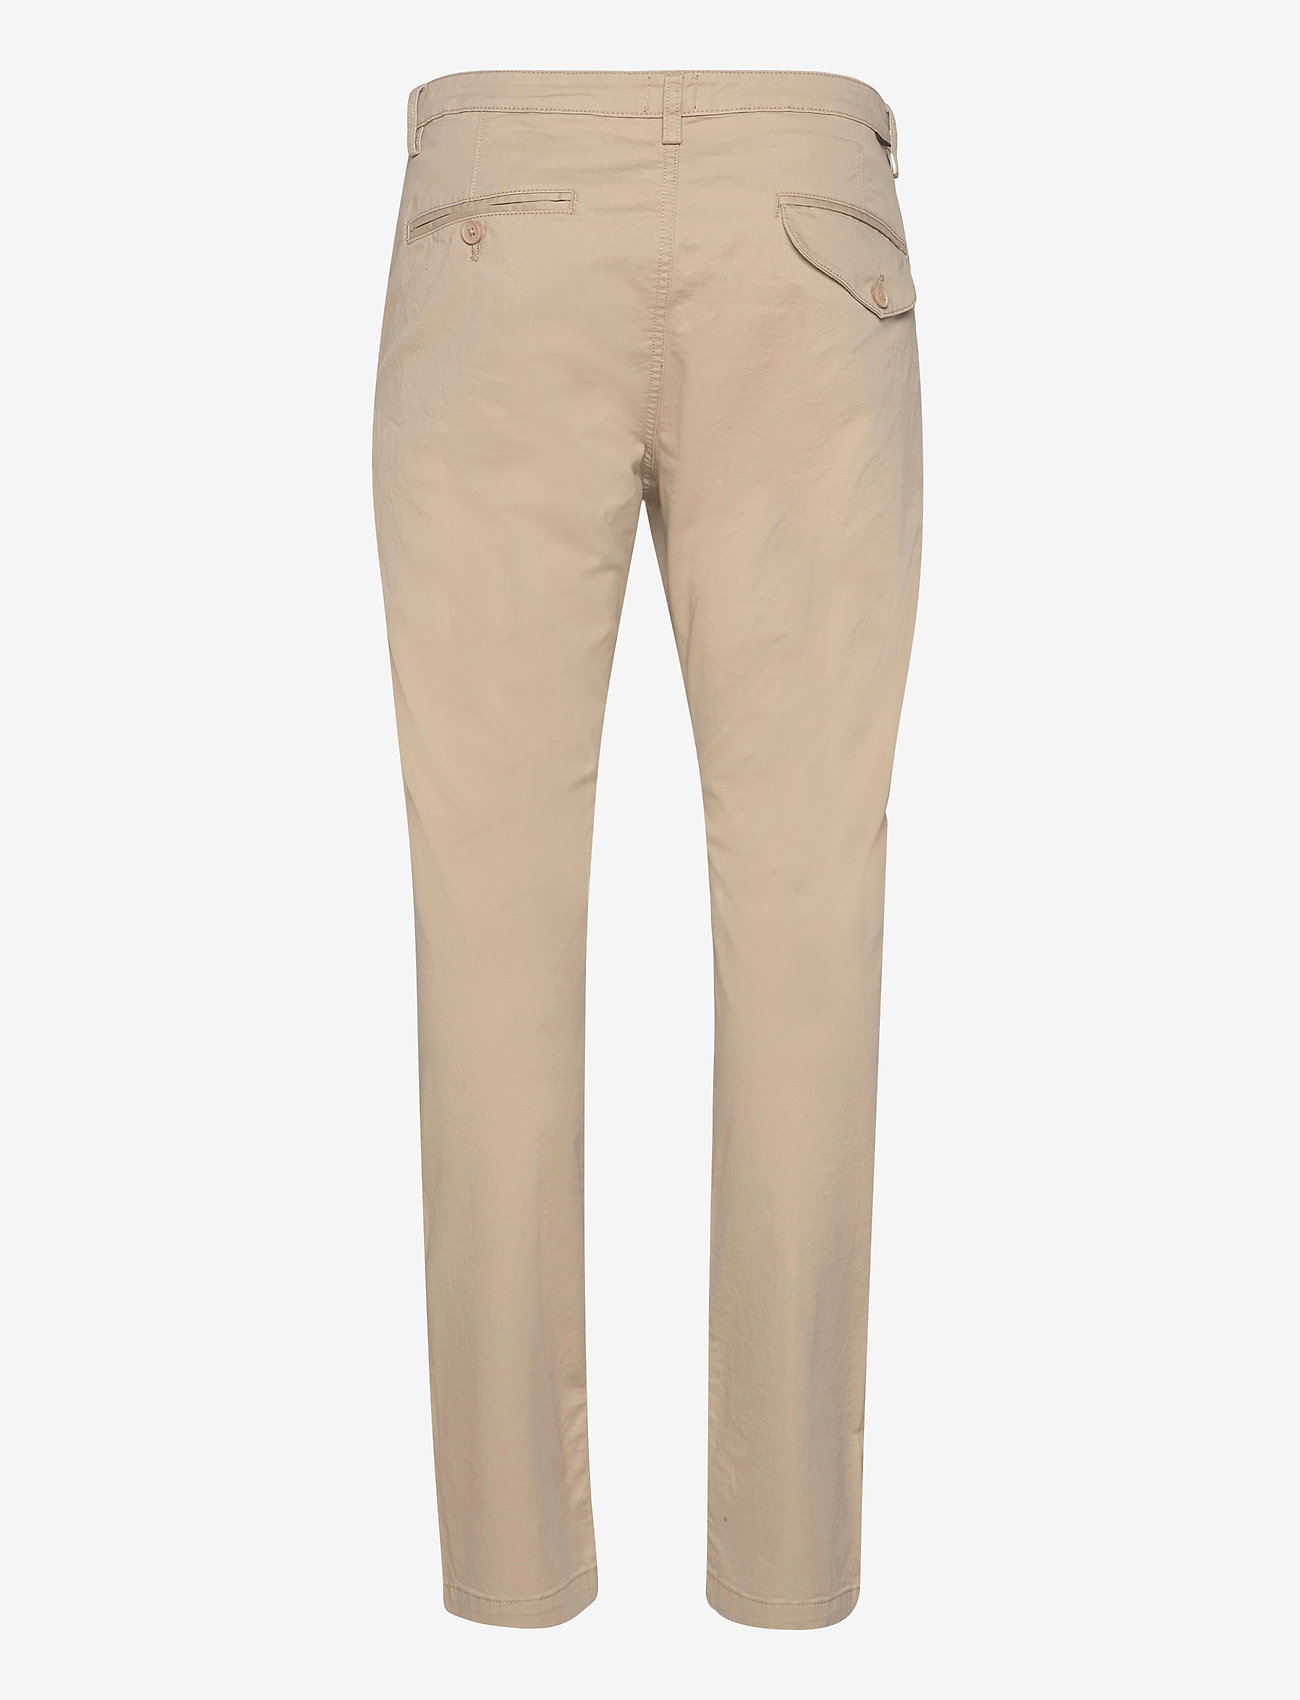 Lee Jeans - SLIM CHINO - chinos - service sand - 1